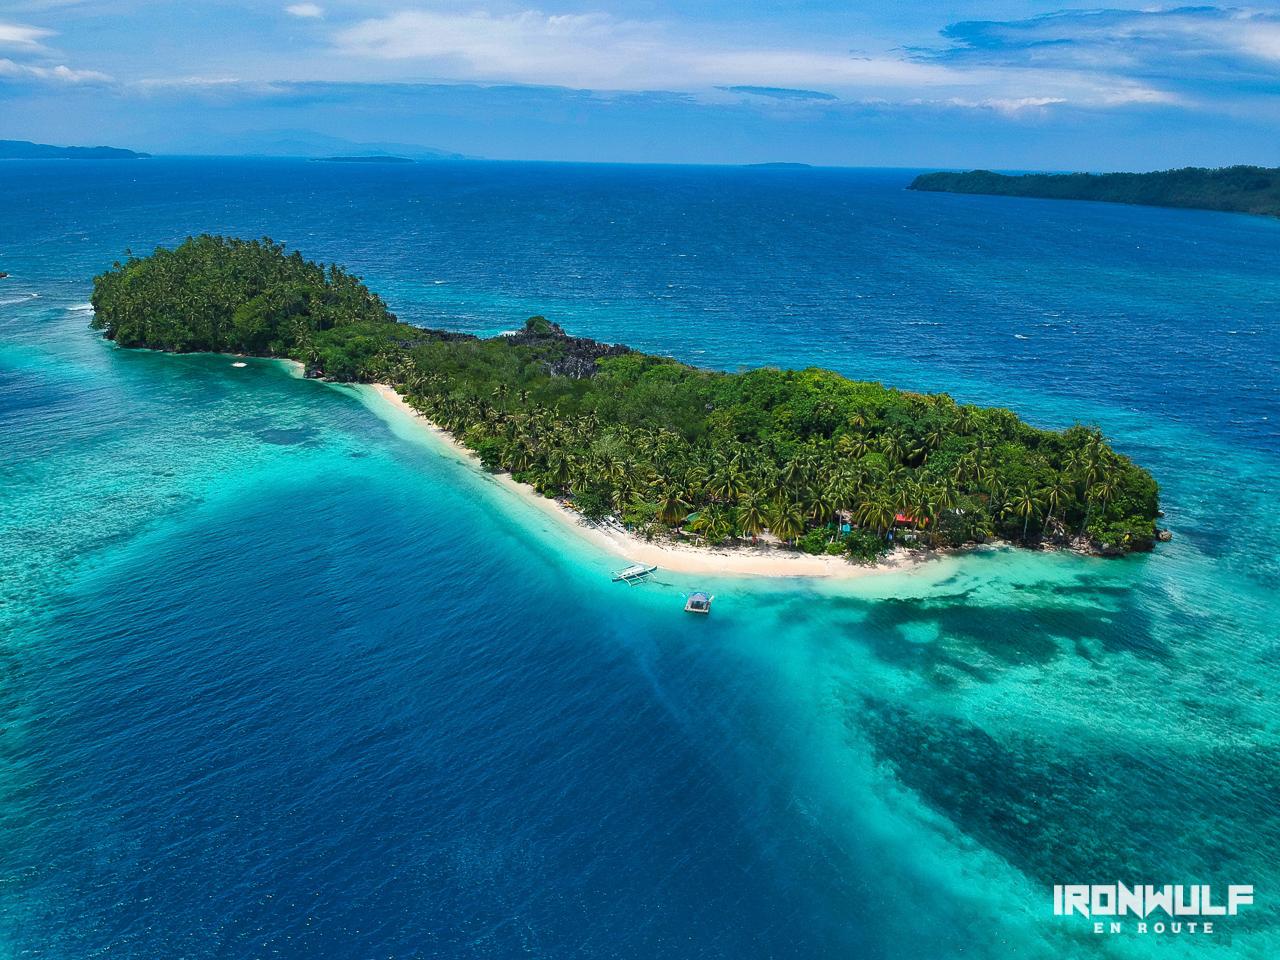 Biray-biray Island